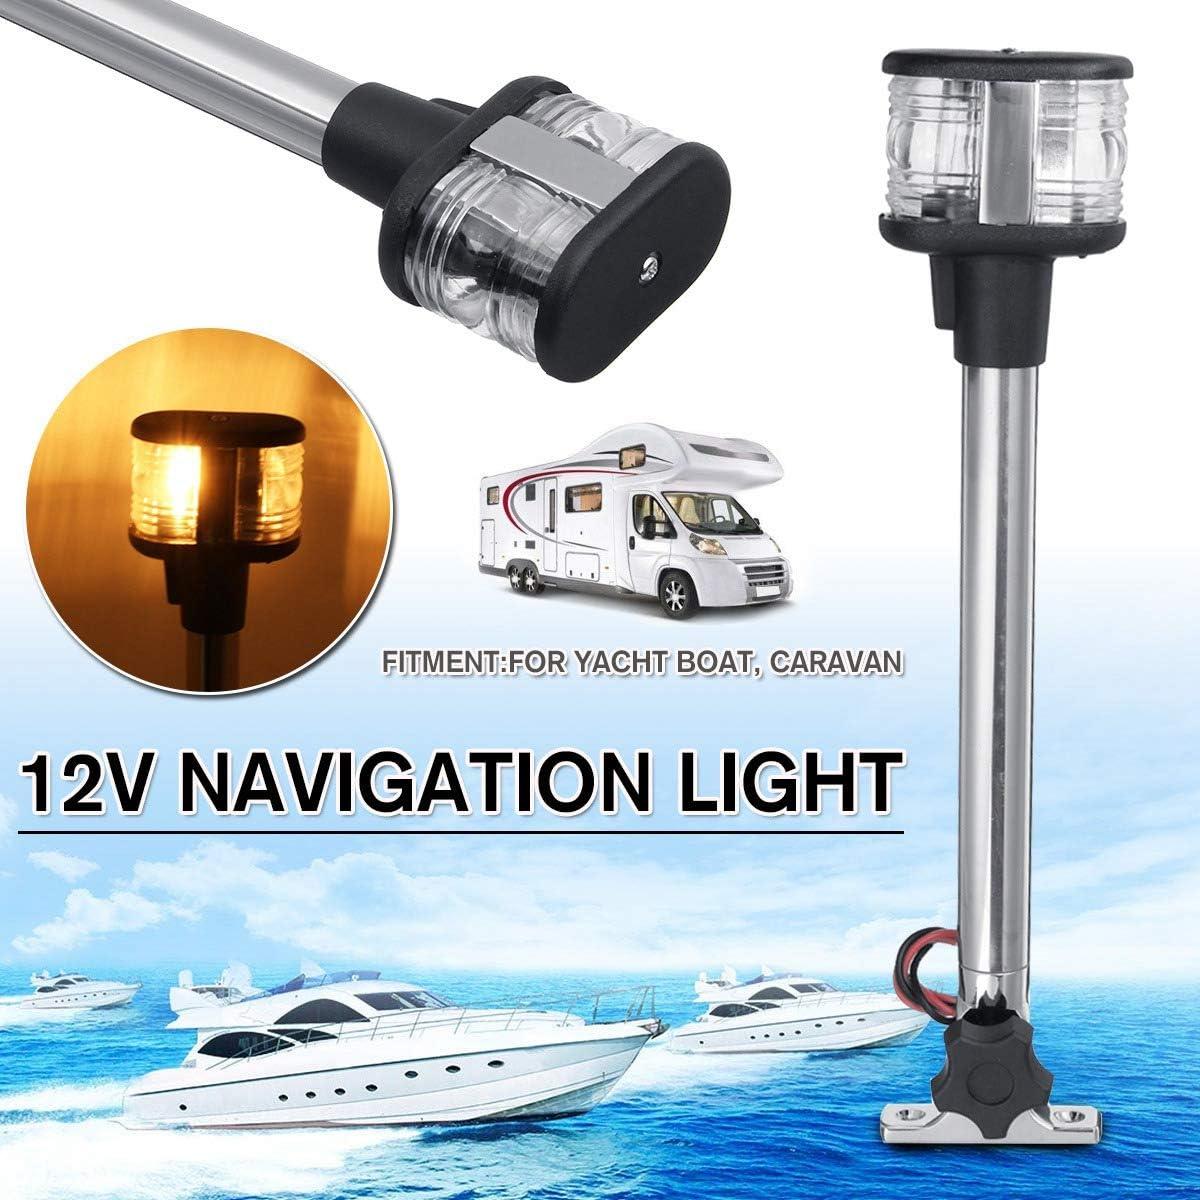 Bestlymood 12-24V Umklappen LED Navigations Licht f/ür Yacht Boot Heck Anker Licht 25Cm Pactrade Marine Boot Segel Signal Licht